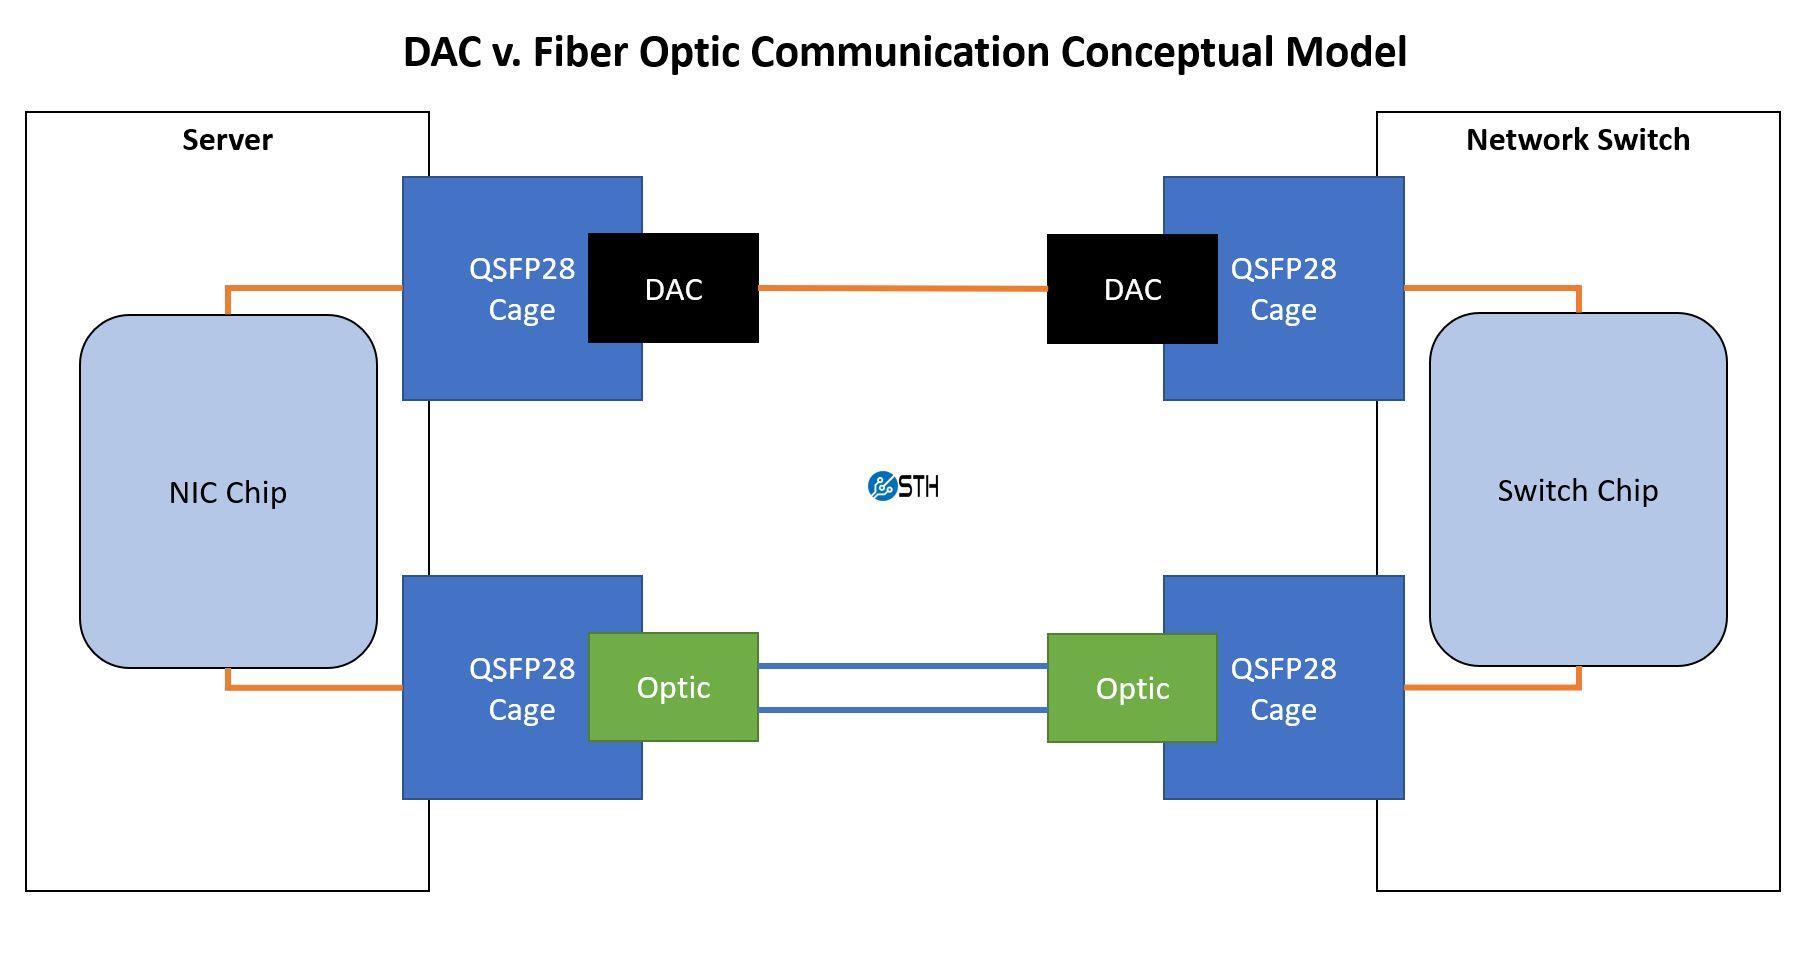 QSFP28 100GbE DAC V Fiber Optic Server To Switch Conceptual Model